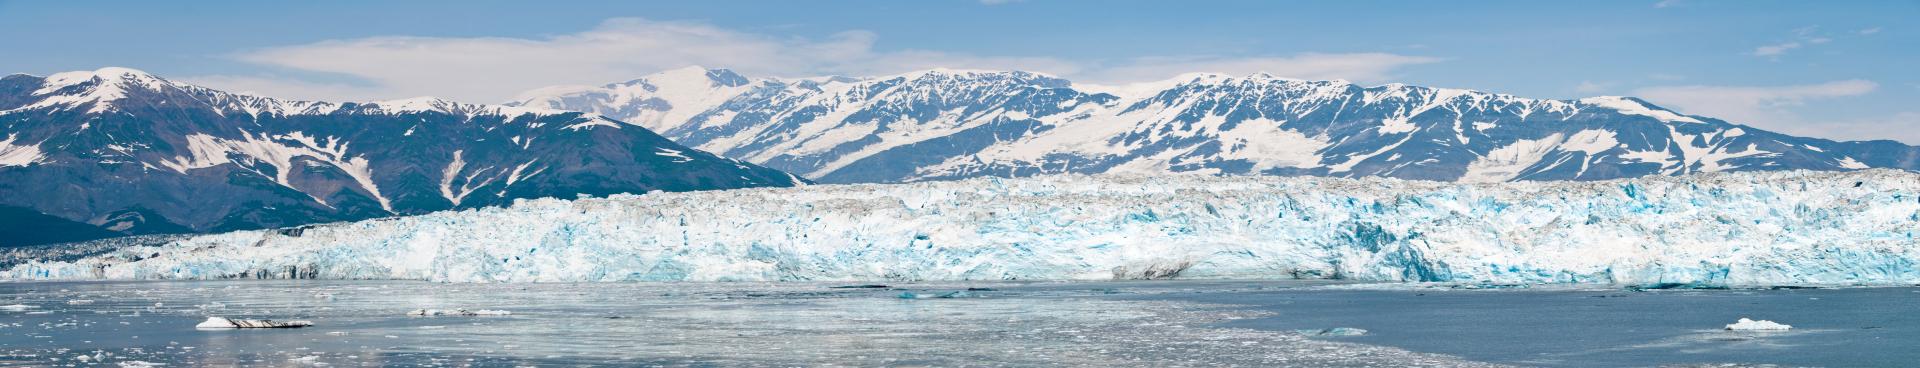 Alaska Pana resized